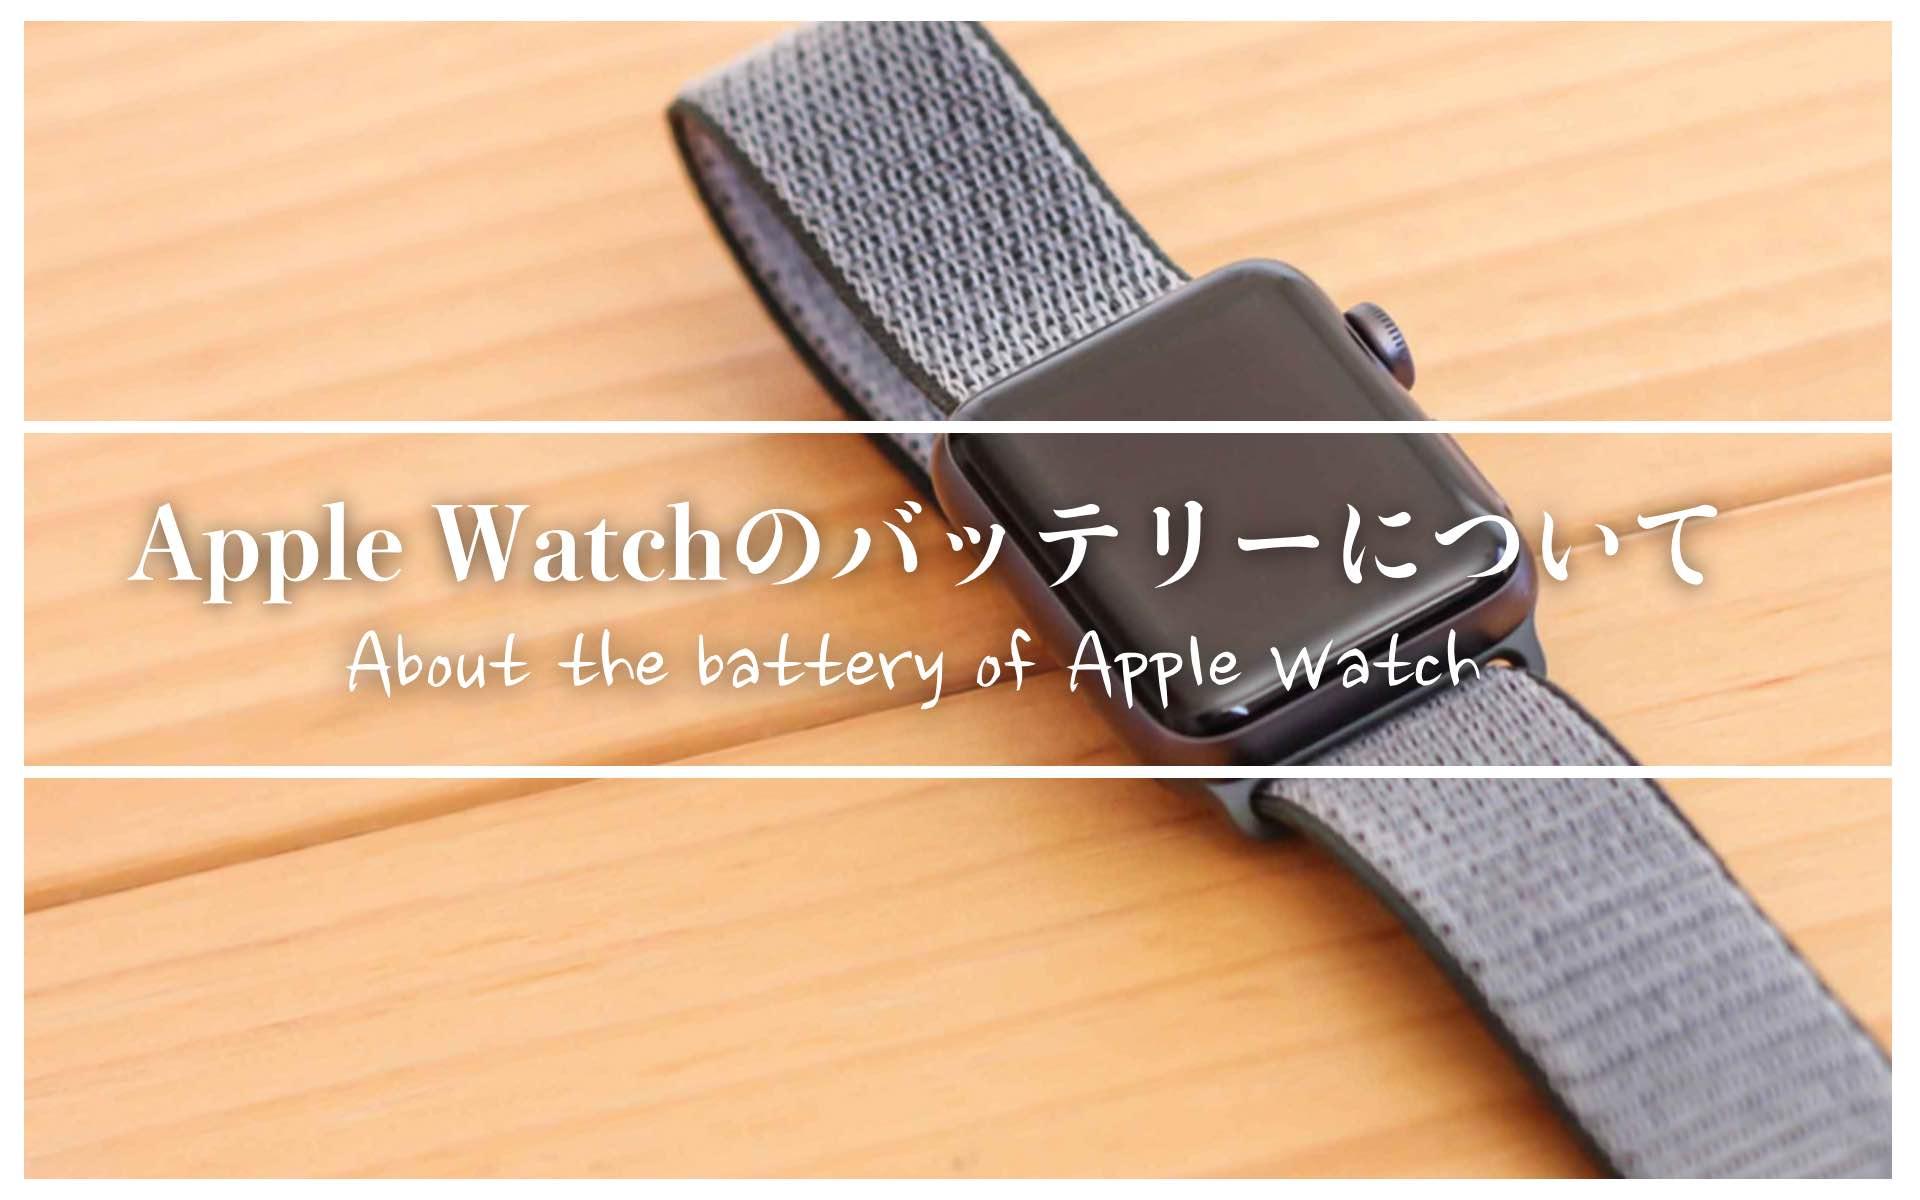 AppleWatchseries3のバッテリーについてのアイキャッチ画像